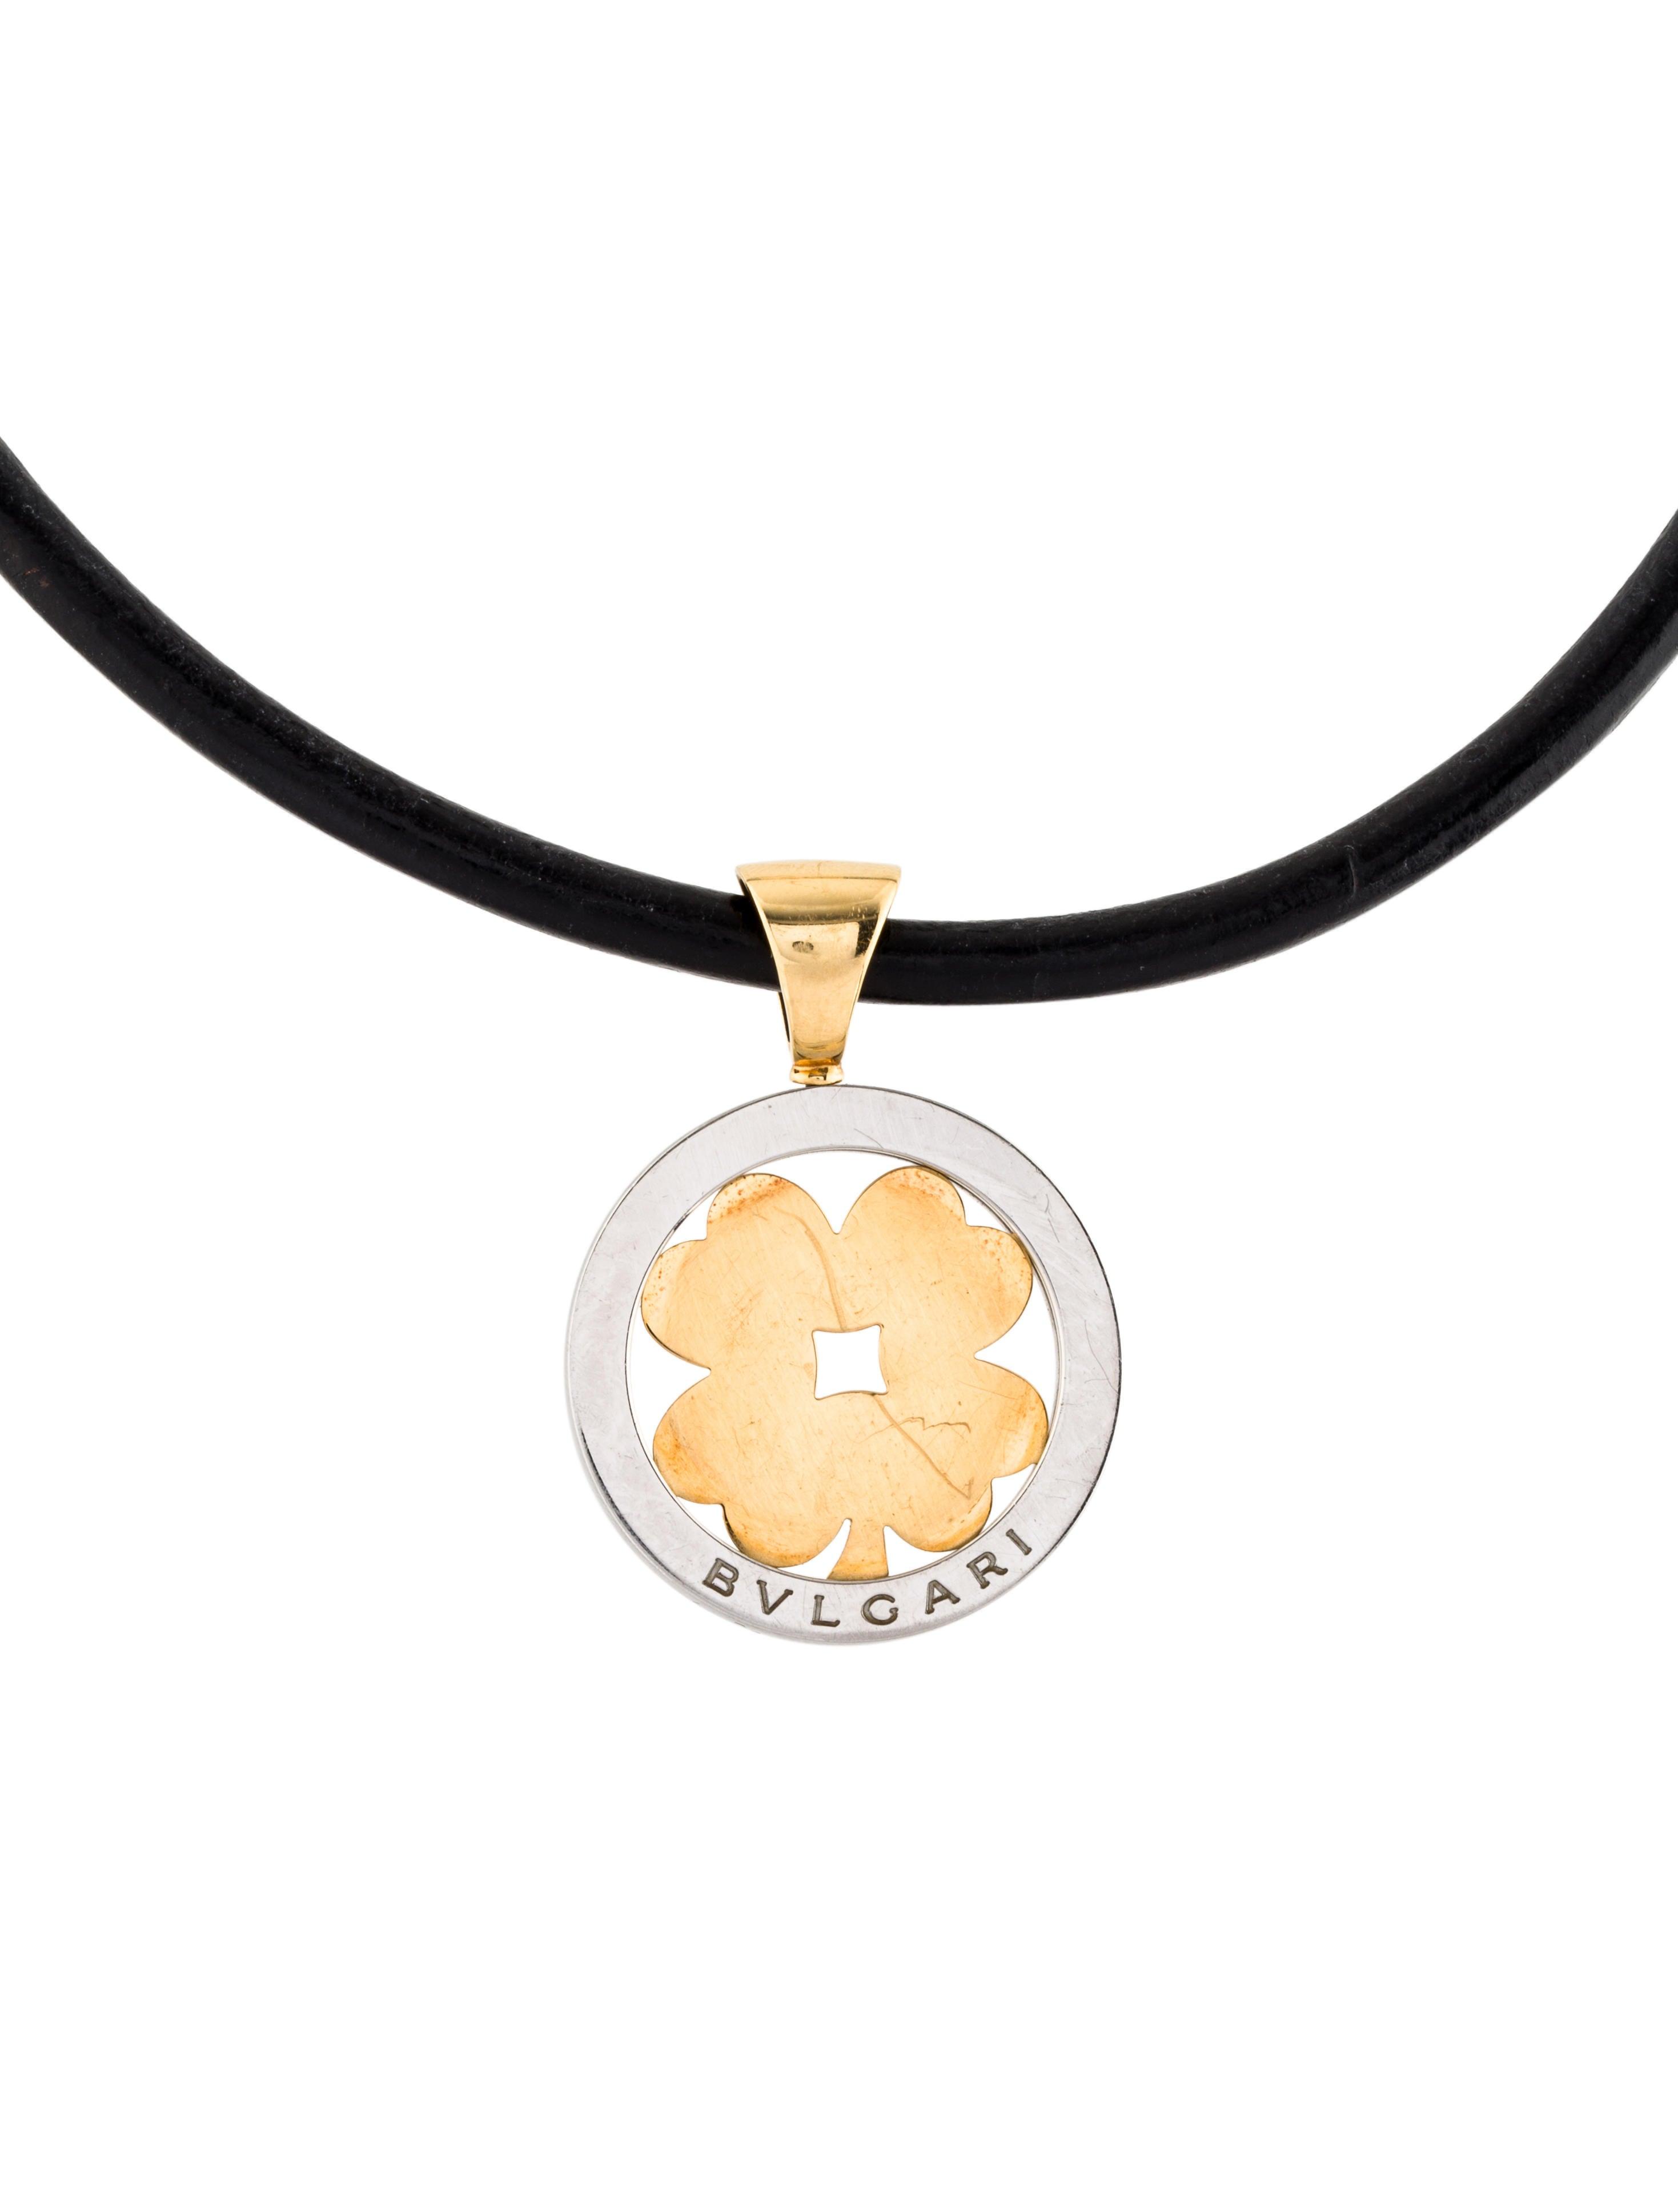 Bvlgari two tone tondo clover pendant necklace necklaces two tone tondo clover pendant necklace aloadofball Image collections